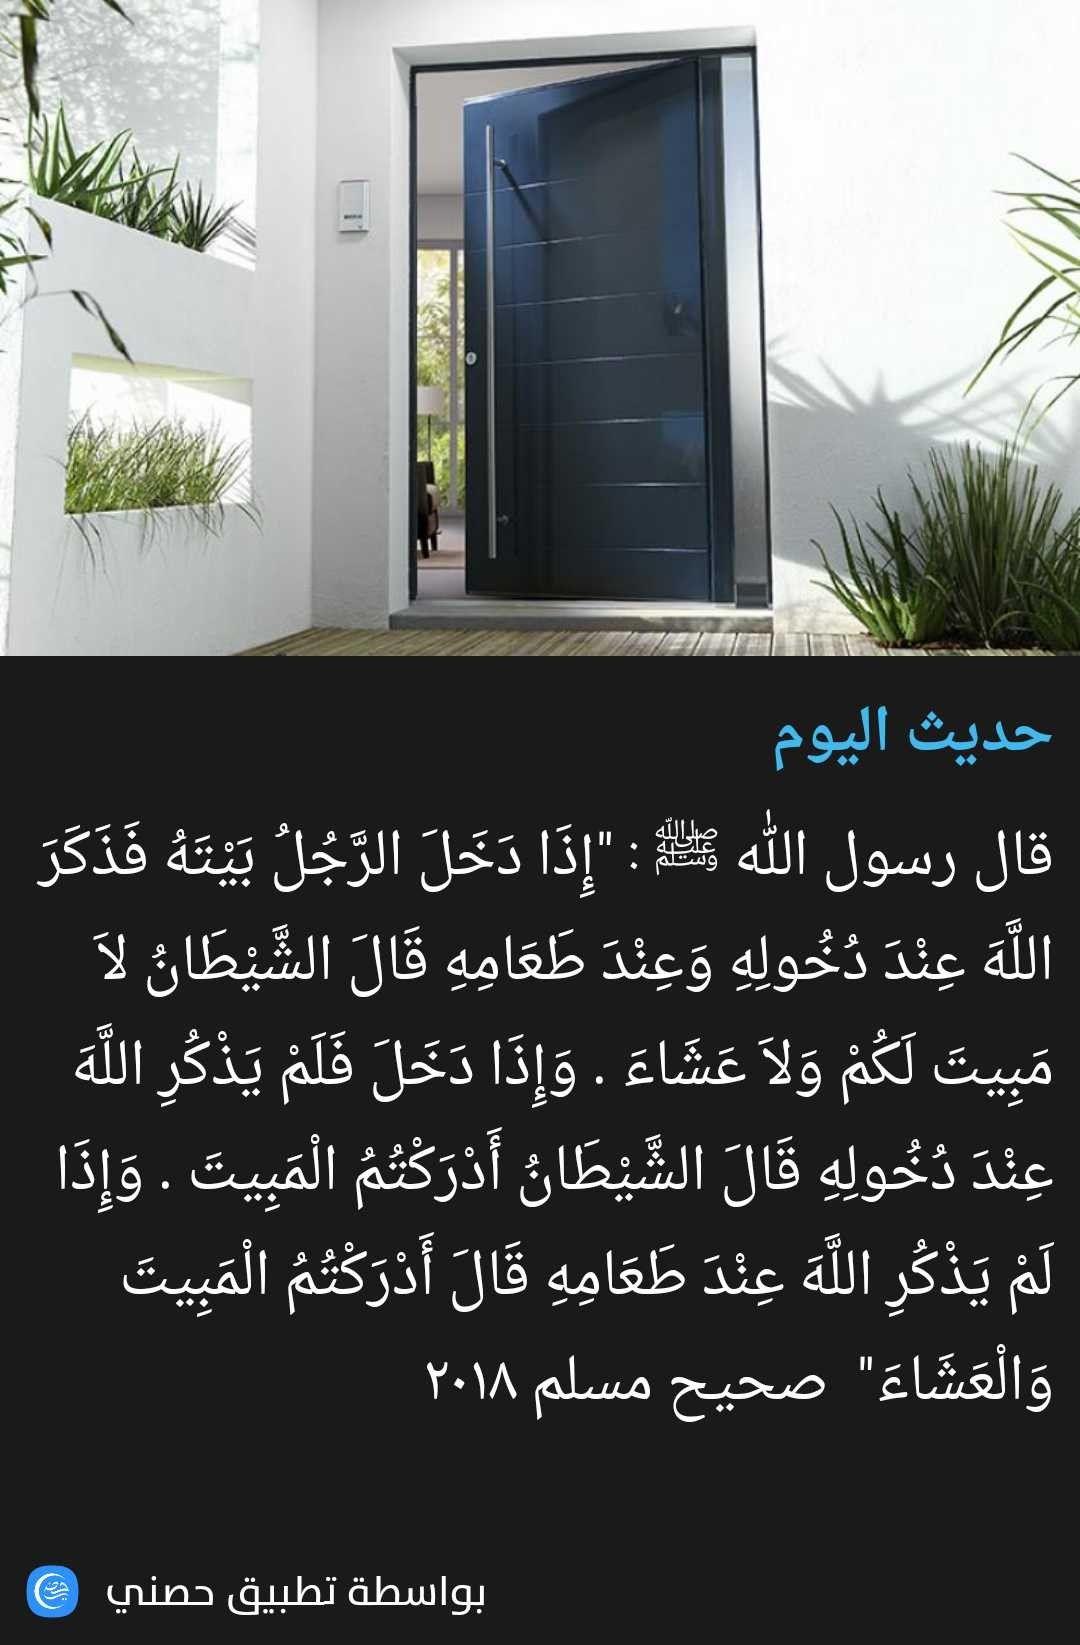 Pin By عبق الورد On أحاديث نبوية ٢ Islam Hadith Ahadith